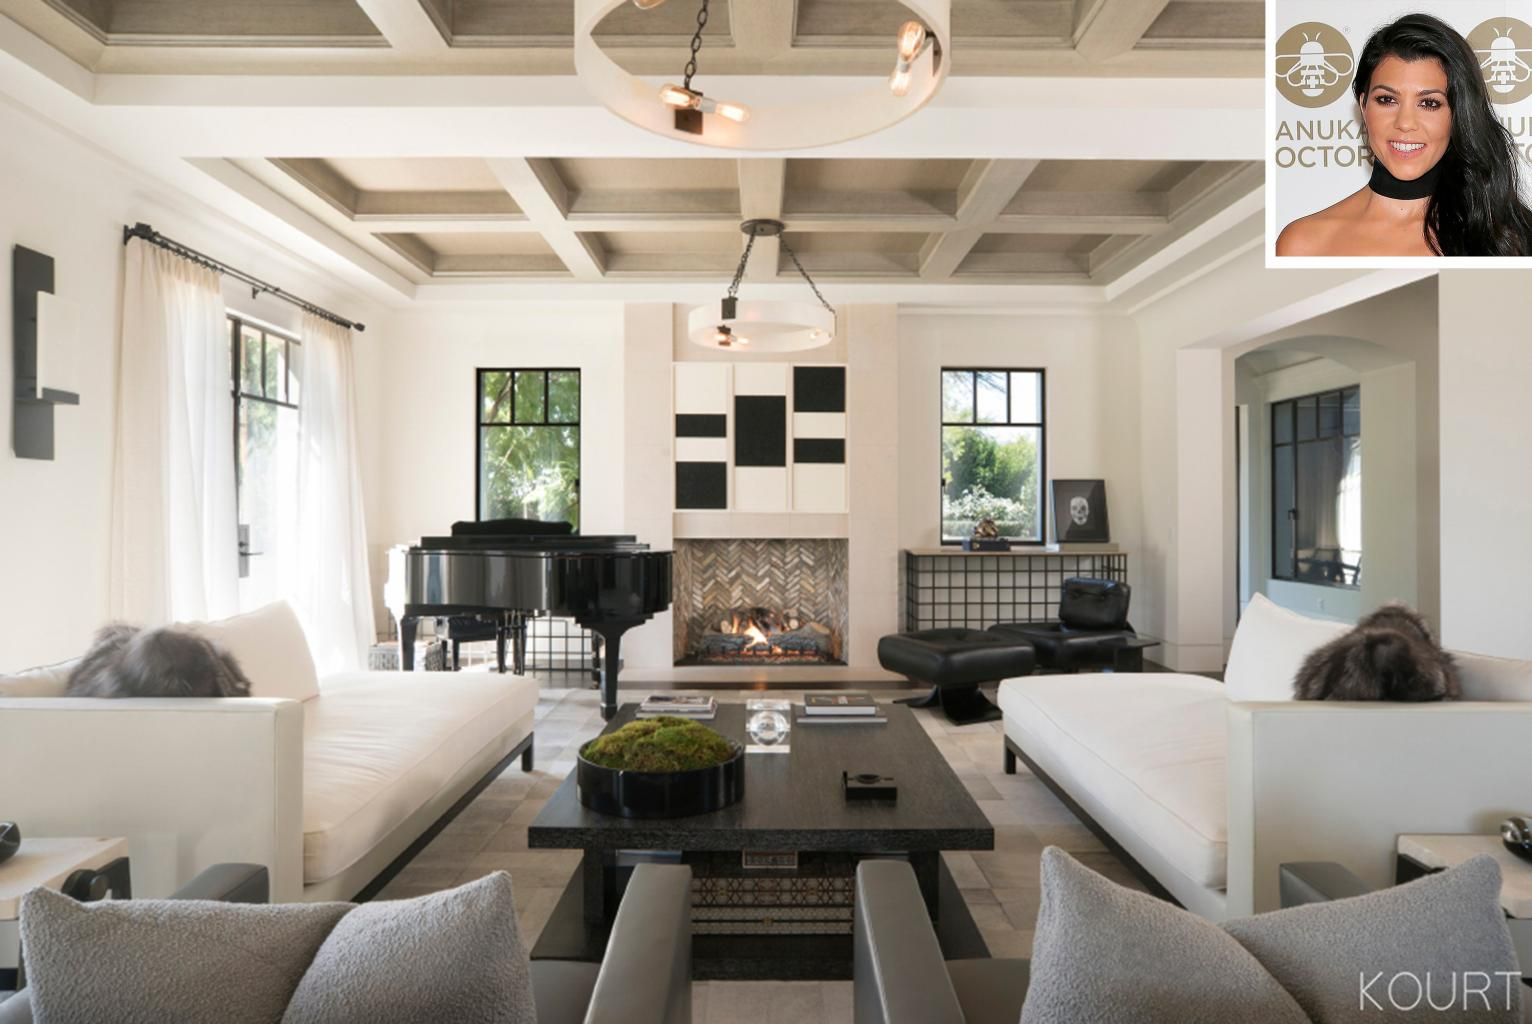 Kourtney Kardashian's Stunning Living Room Includes a Sentimental — and Huge — Present from Kris Jenner